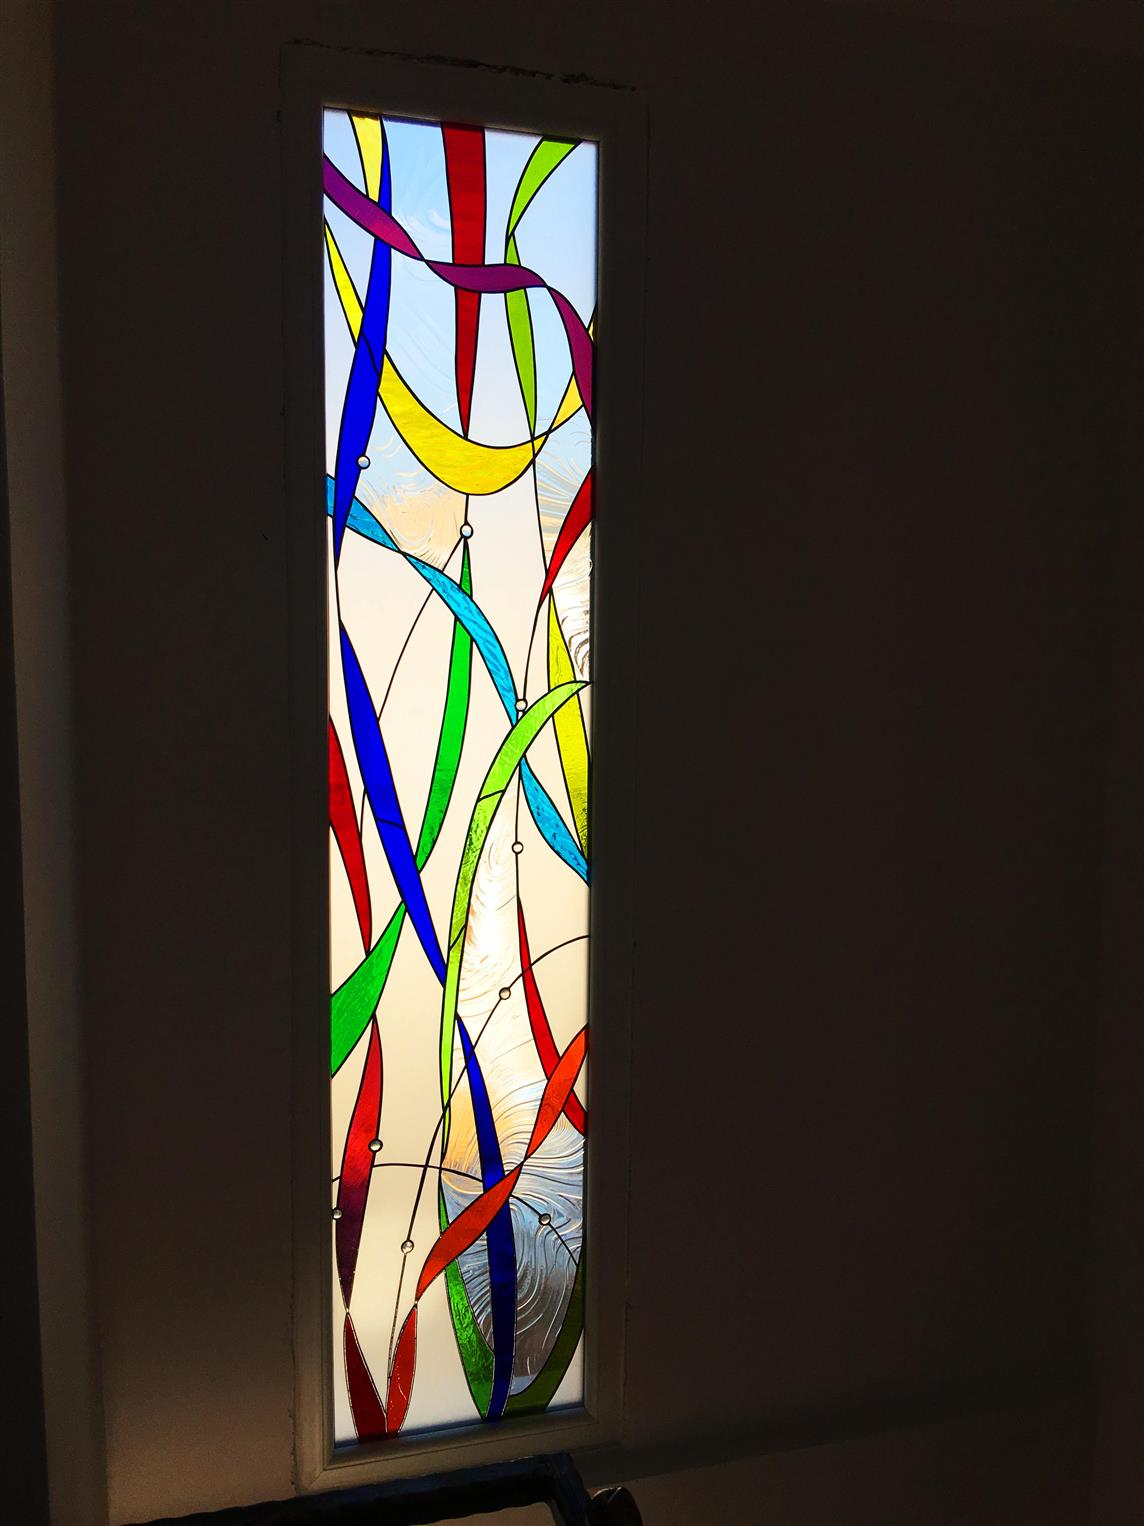 merdiven-cikisi-vitraylari20171221191634975.jpg izmir vitray çalışması